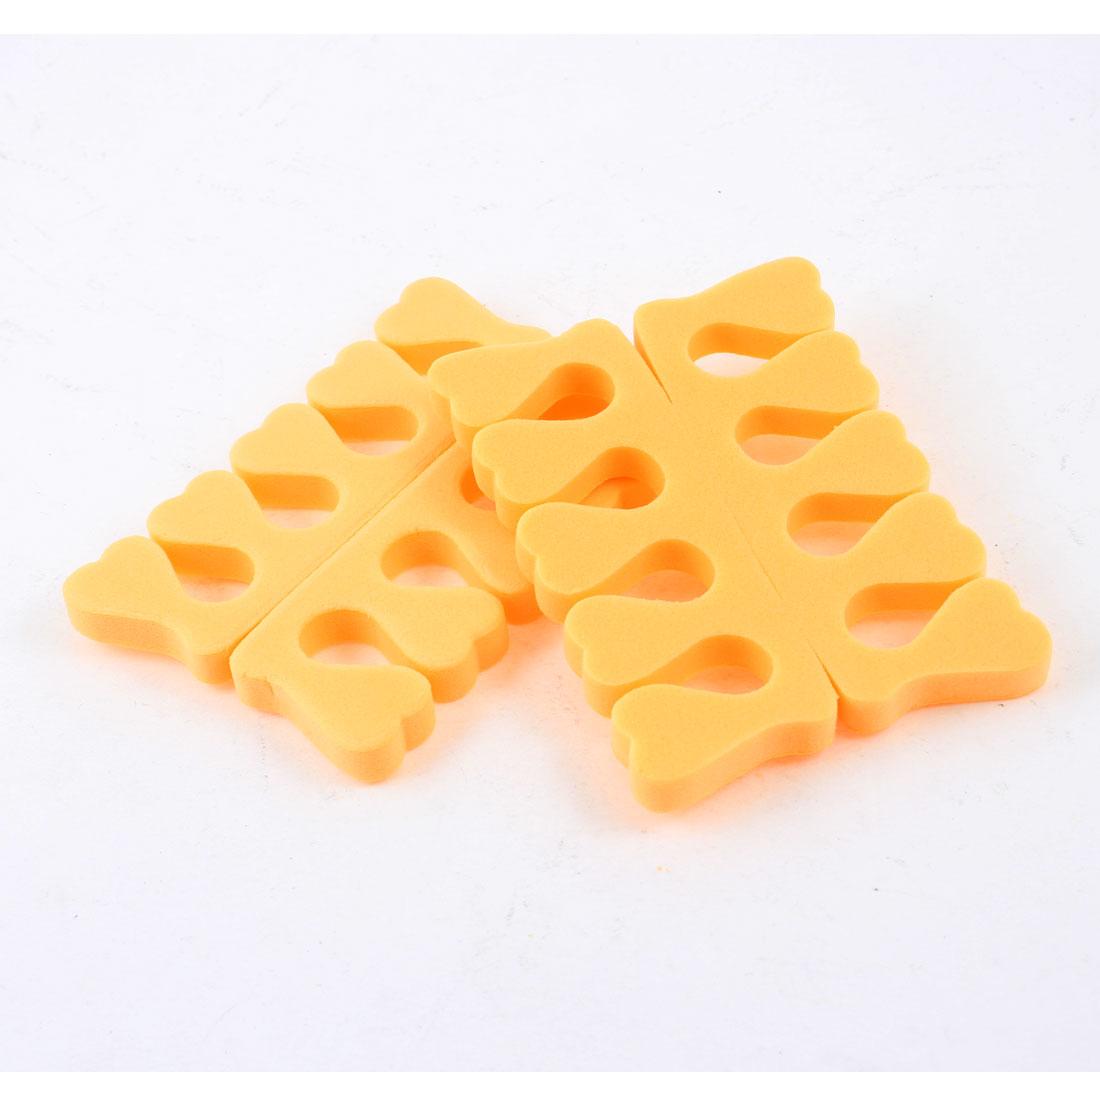 2 Pcs Nail Art Manicure Pedicure Foam Finger Toe Separator Orange